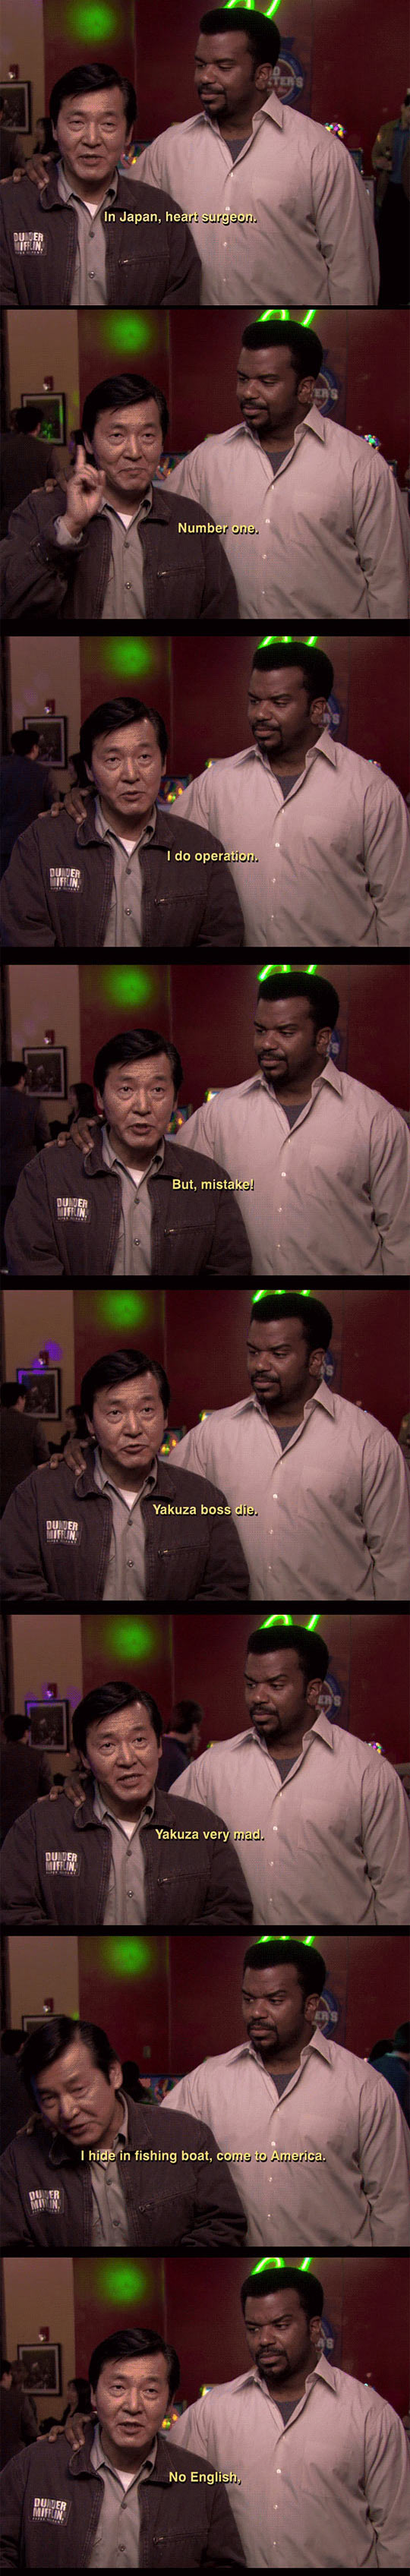 funny-Office-Darryl-Japan-heart-surgeon